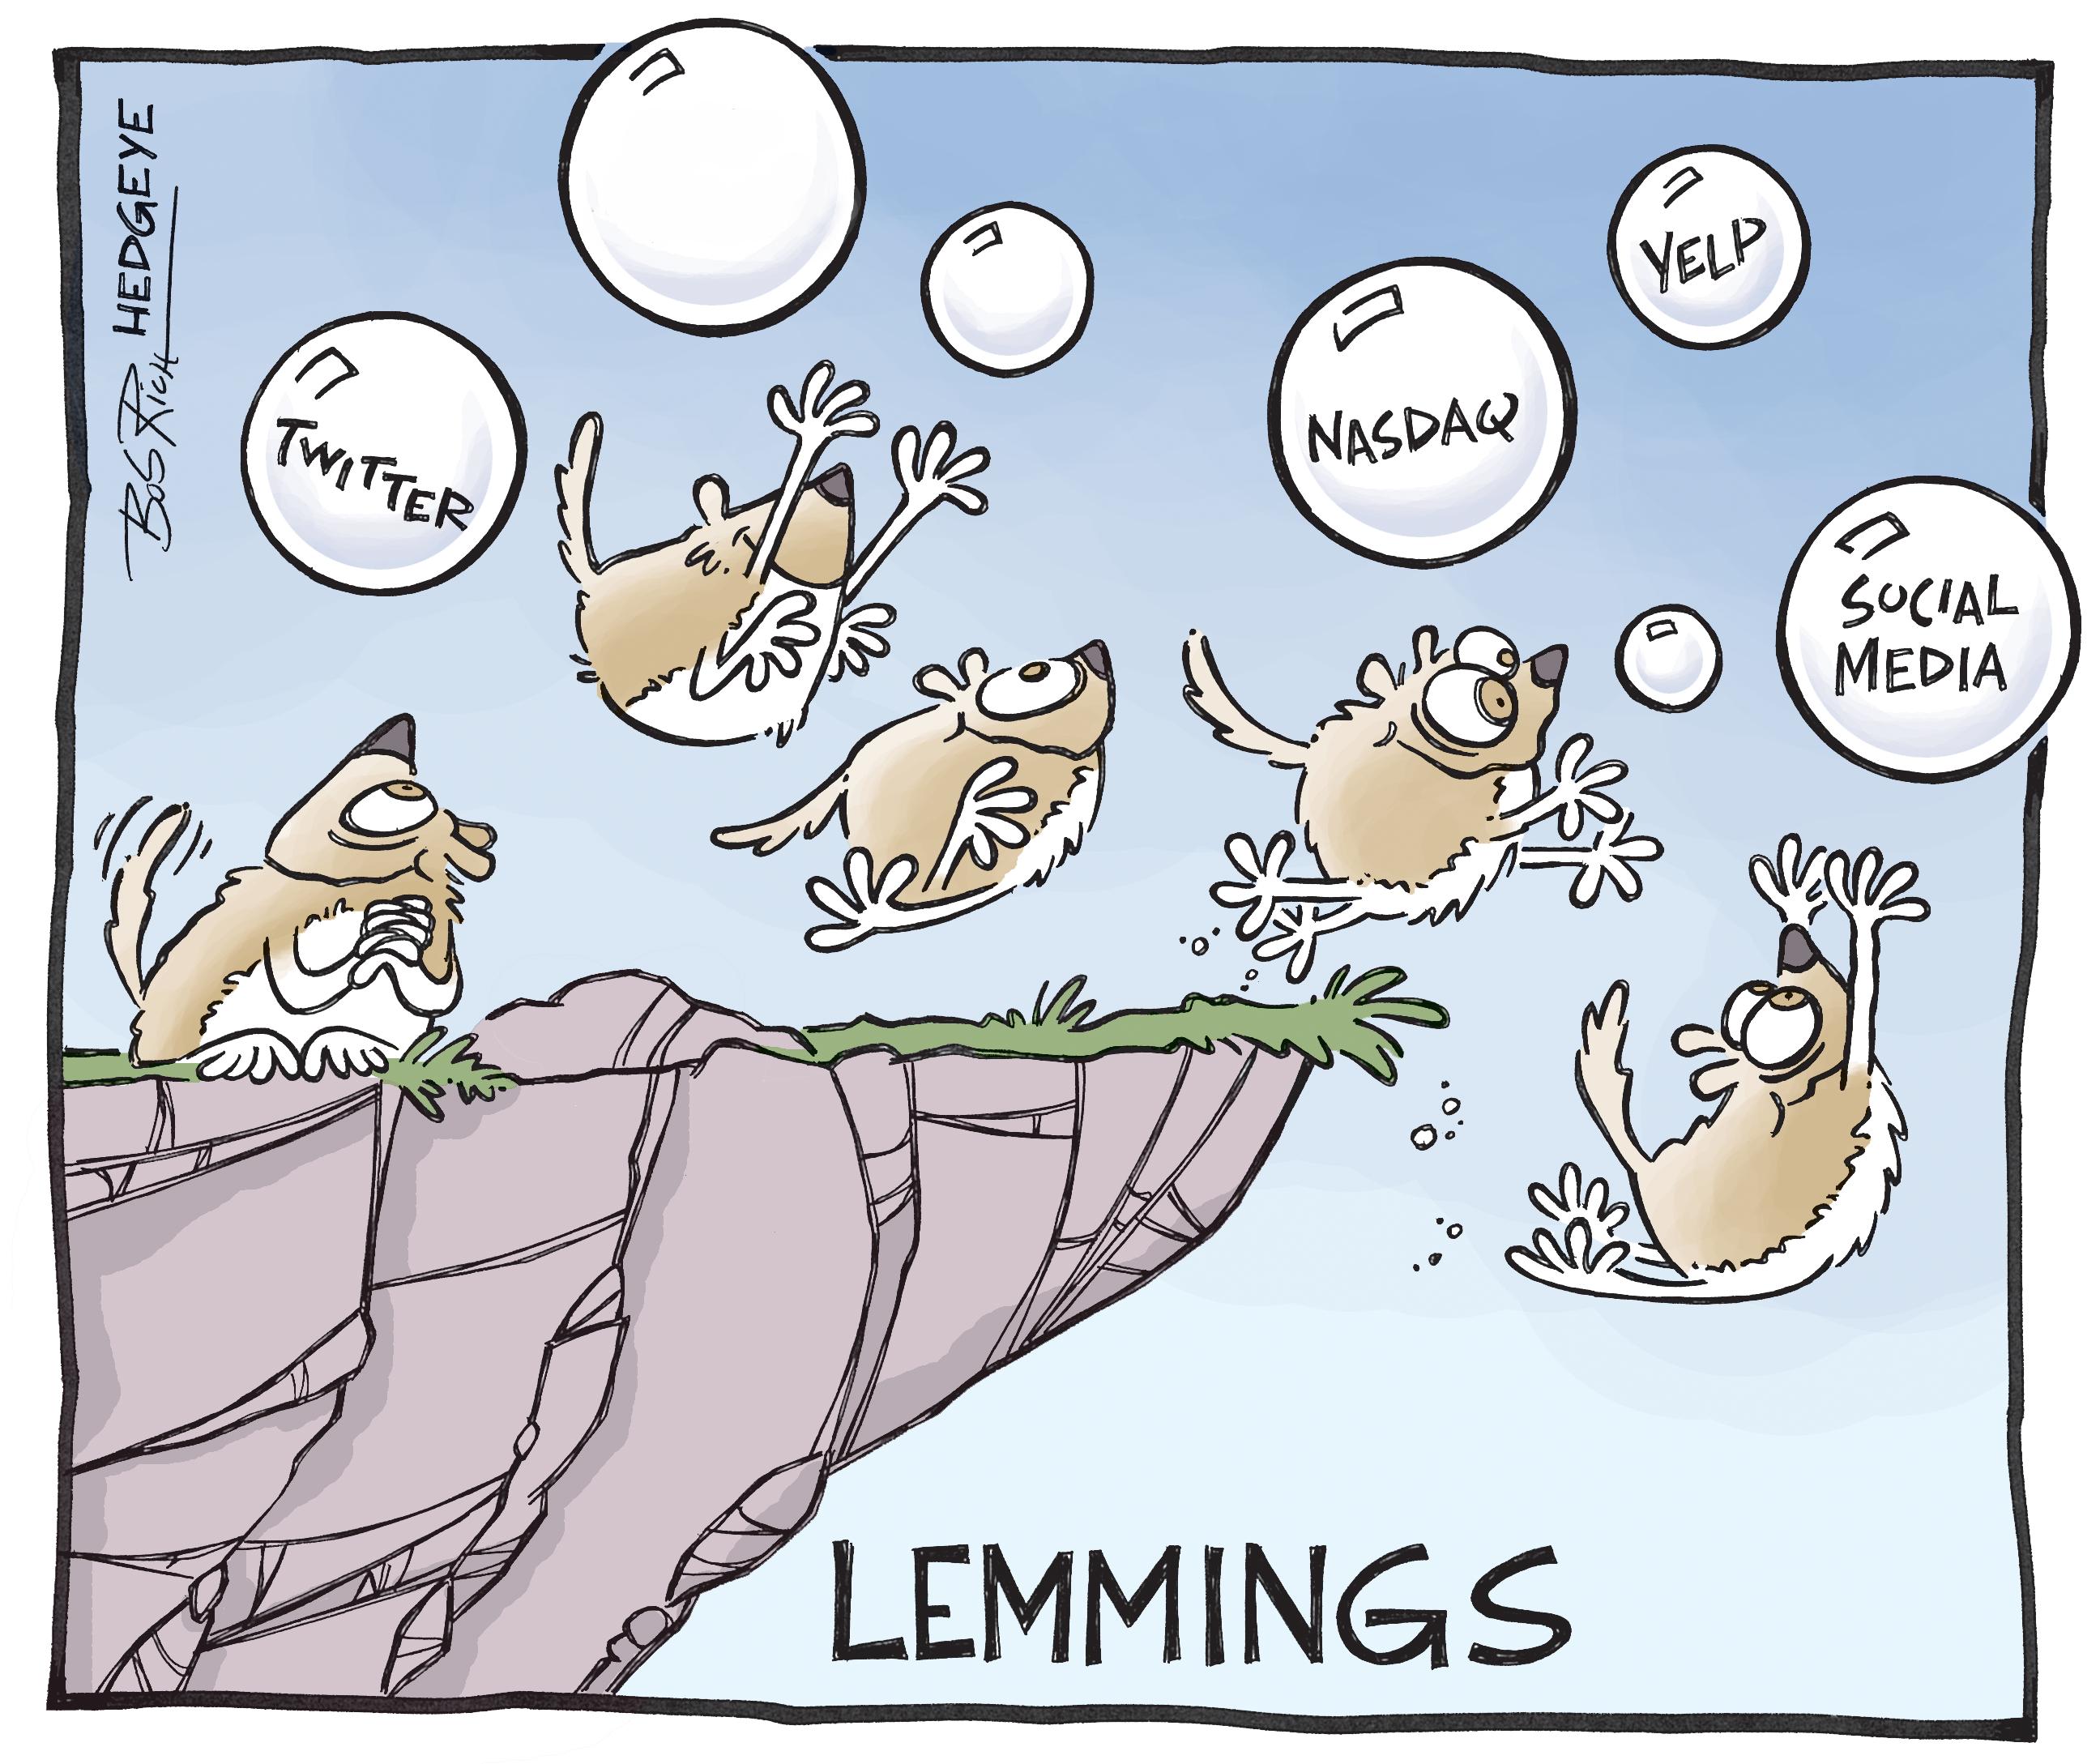 Risultato immagini per lemmings cartoons